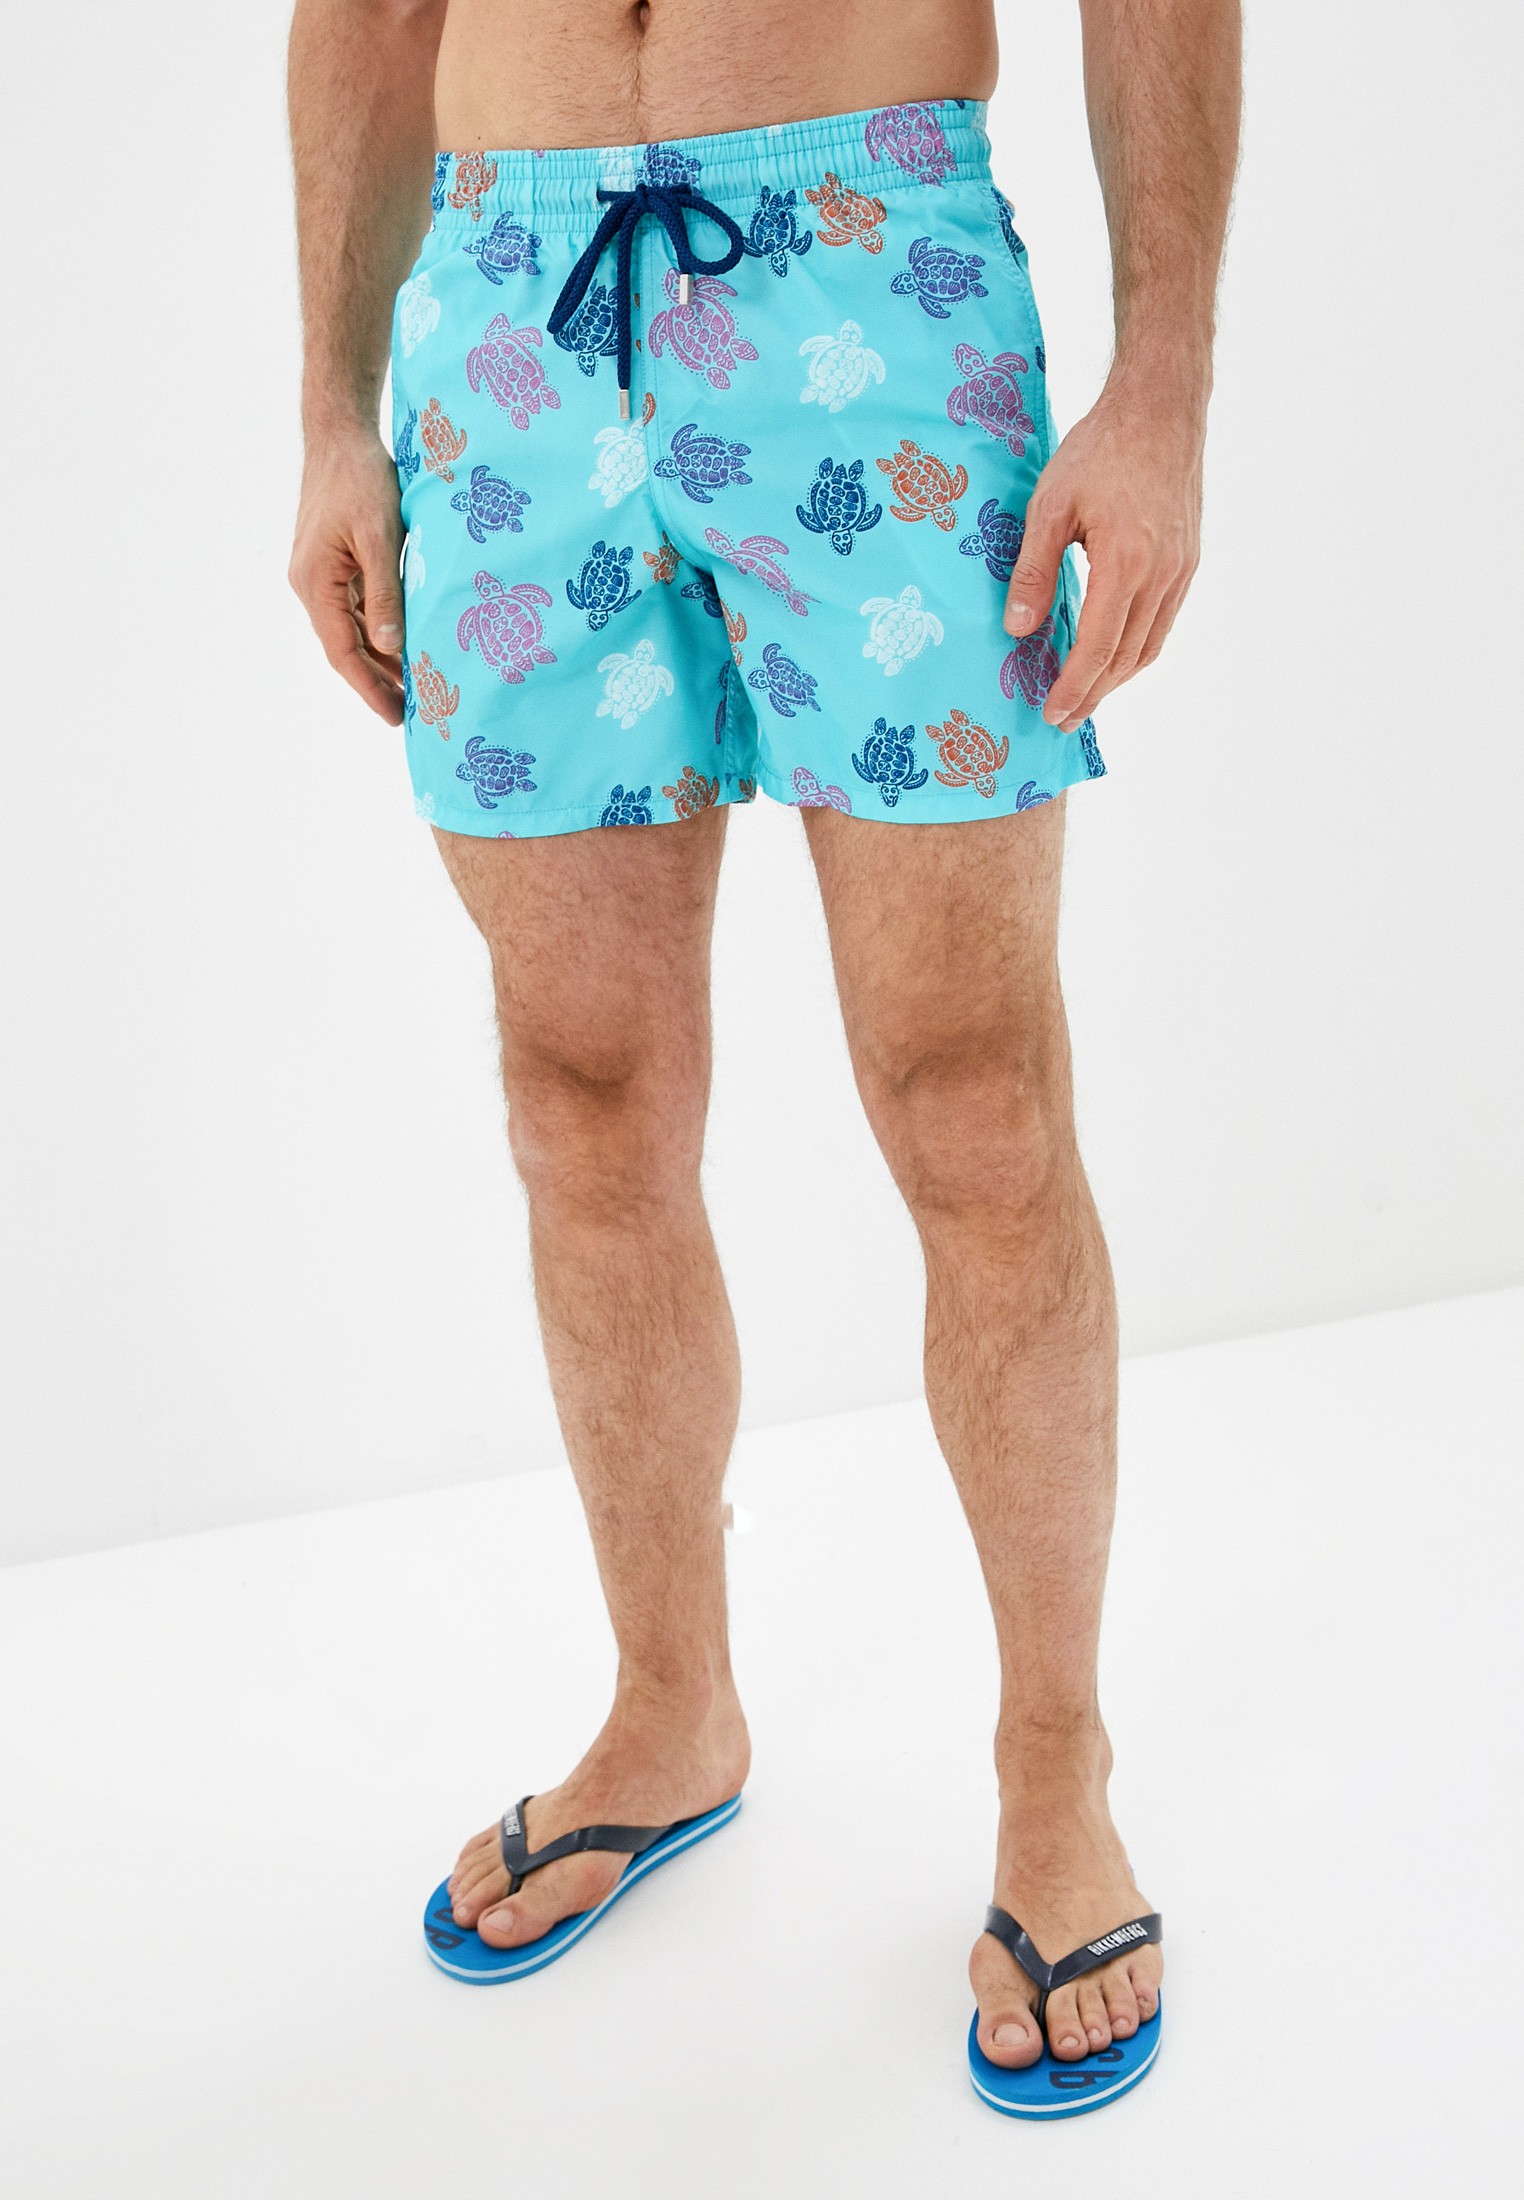 Мужские шорты для плавания Vilebrequin Шорты для плавания Vilebrequin